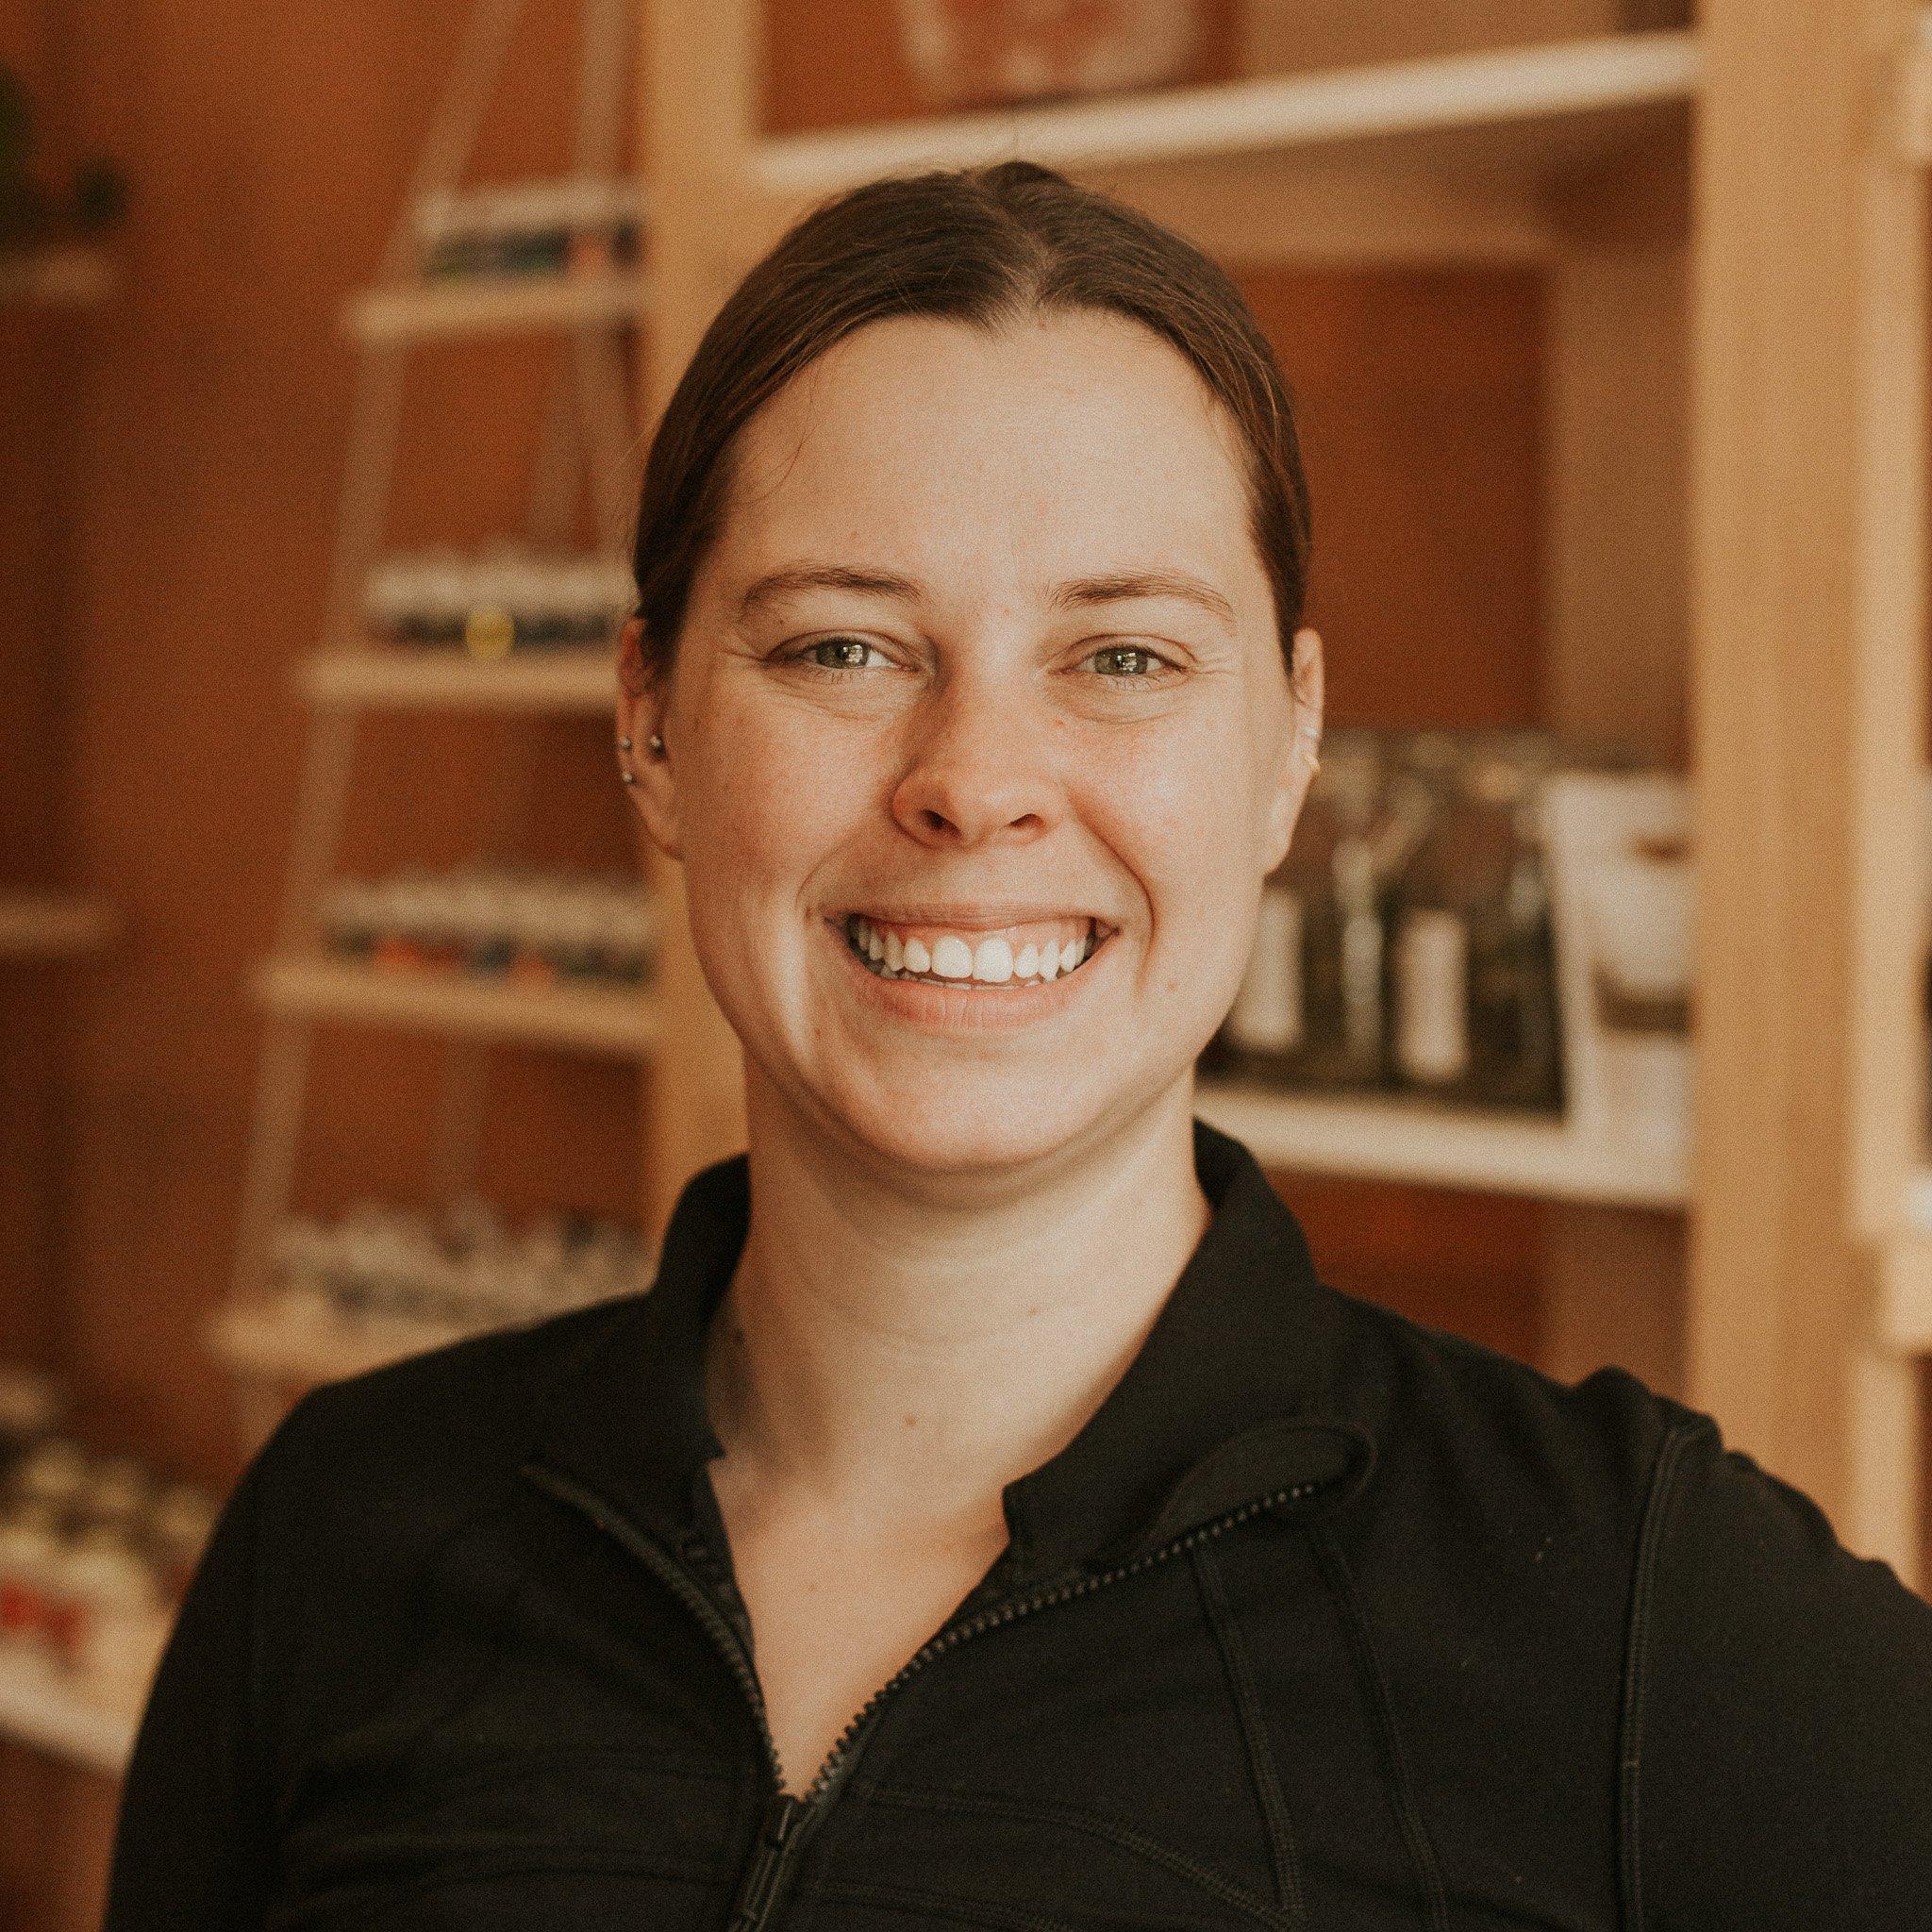 Meet our newest Yoga Teacher: Rebecca!